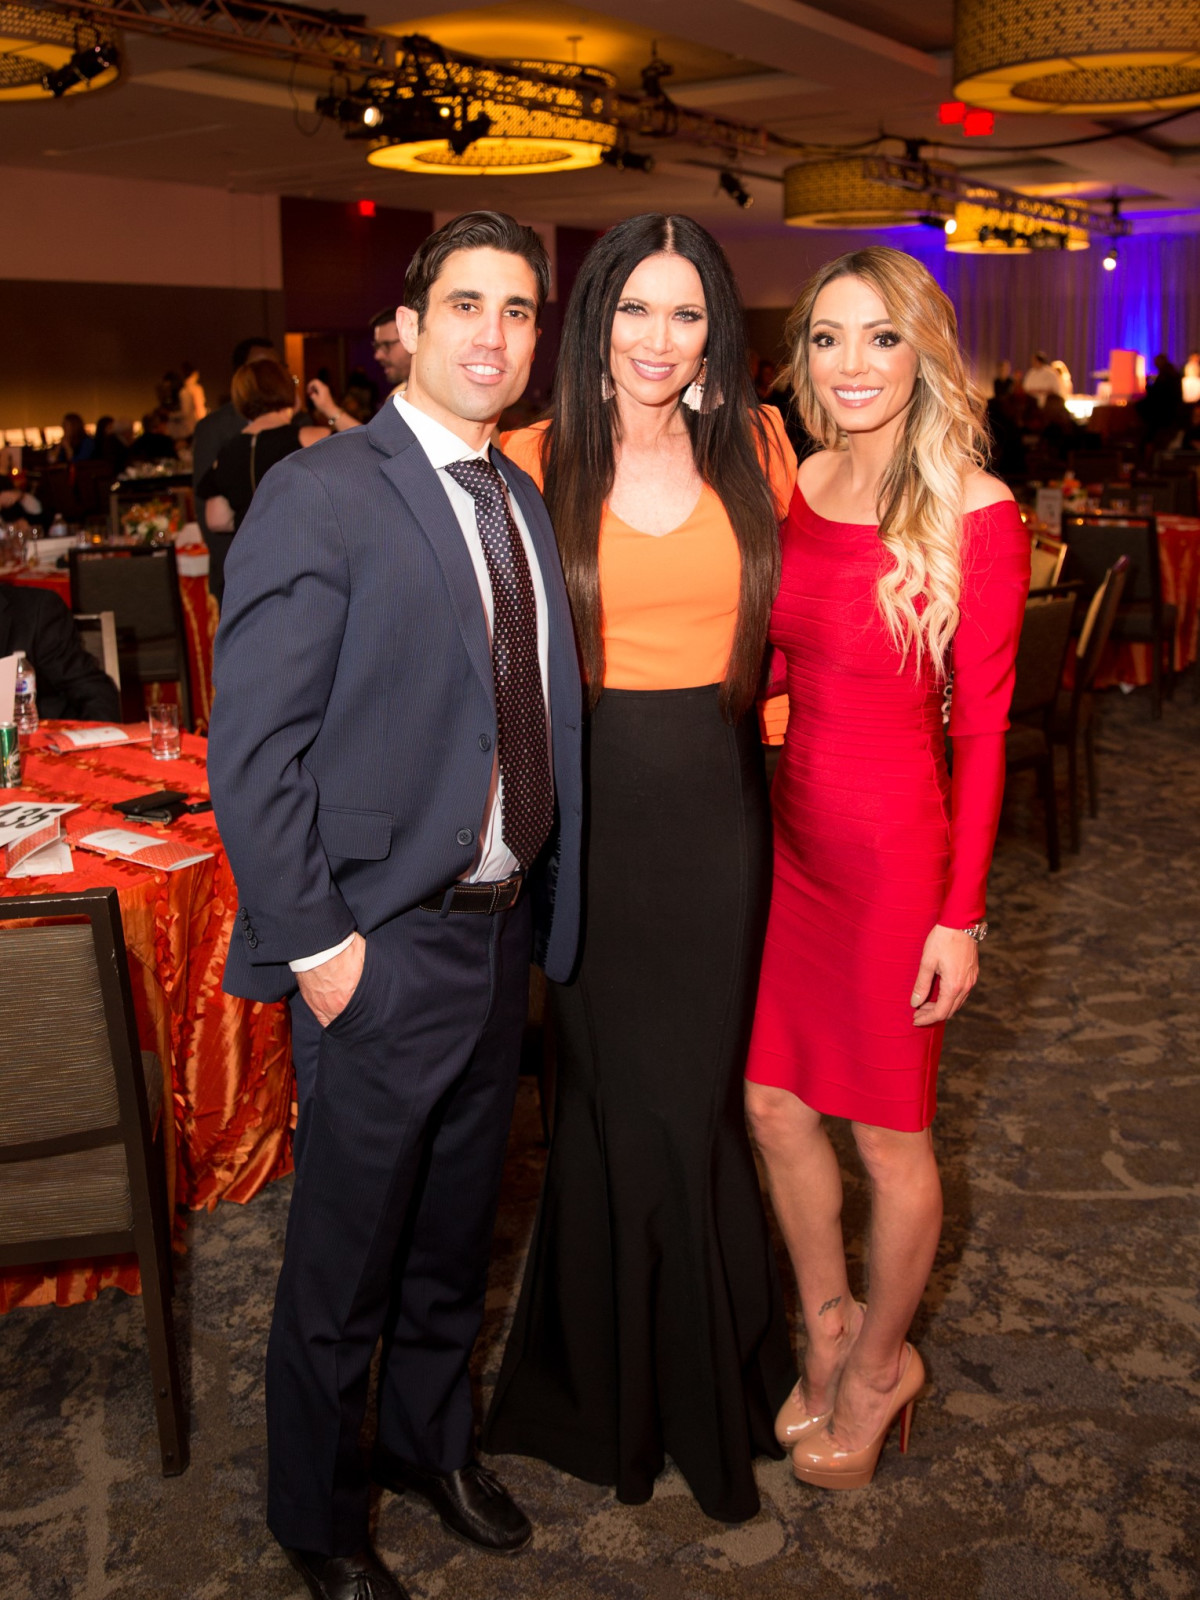 Bonne Sante 2018, Dr.  Demetri Arnaoutakis, LeeAnne Locken, Jennifer Gaydos-Hartman